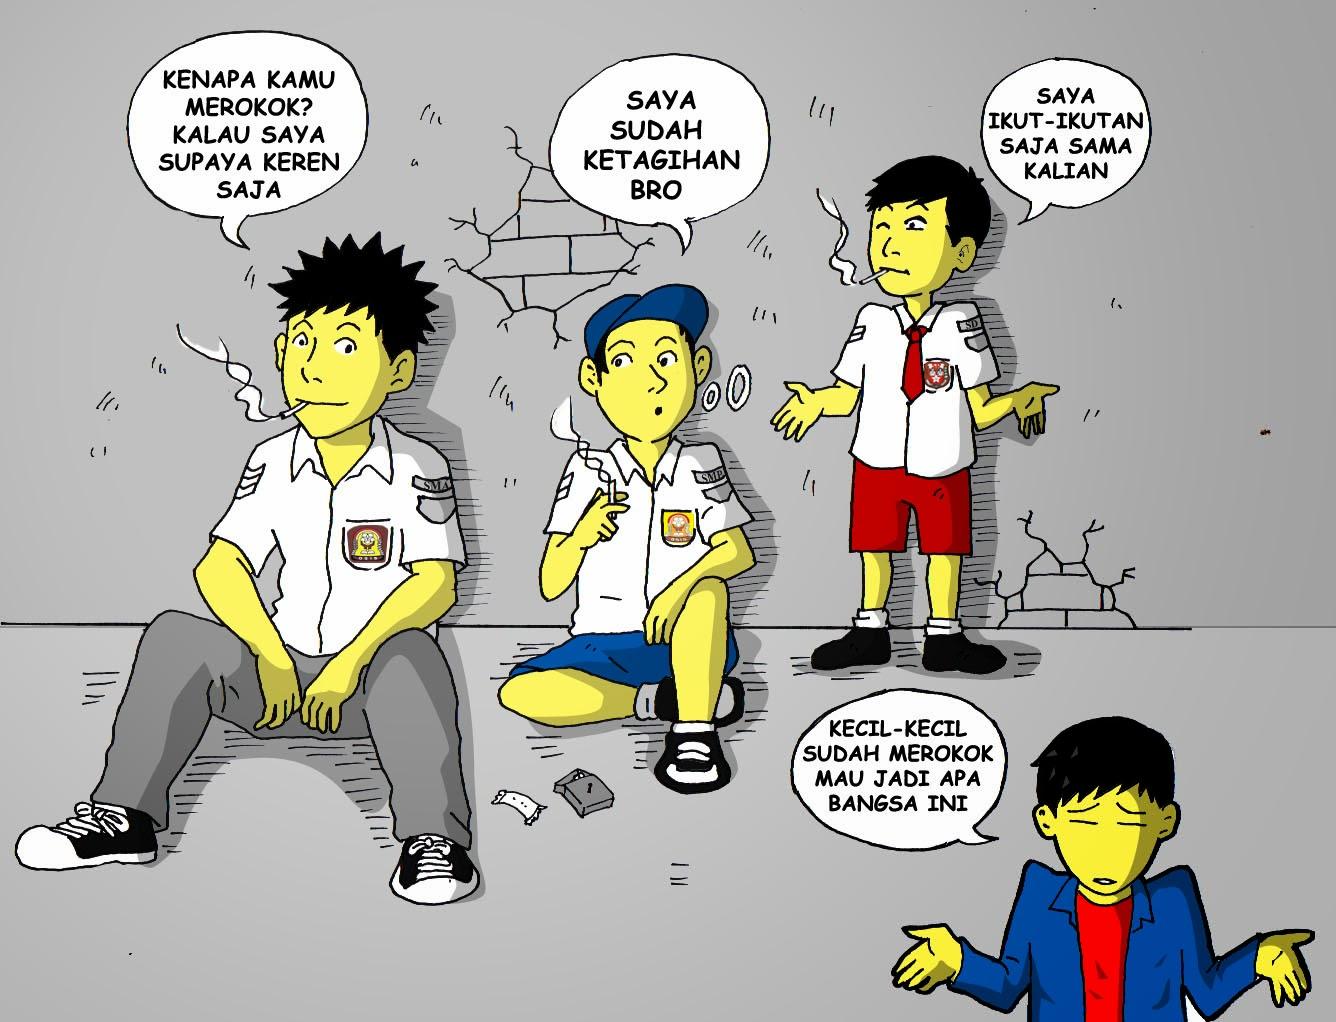 Perilaku Remaja 2013 Makalah Bahaya Narkoba Bagi Remaja Tugasku4u Komik Fisika Fenomena Perilaku Merokok Usia Muda Di Indonesia